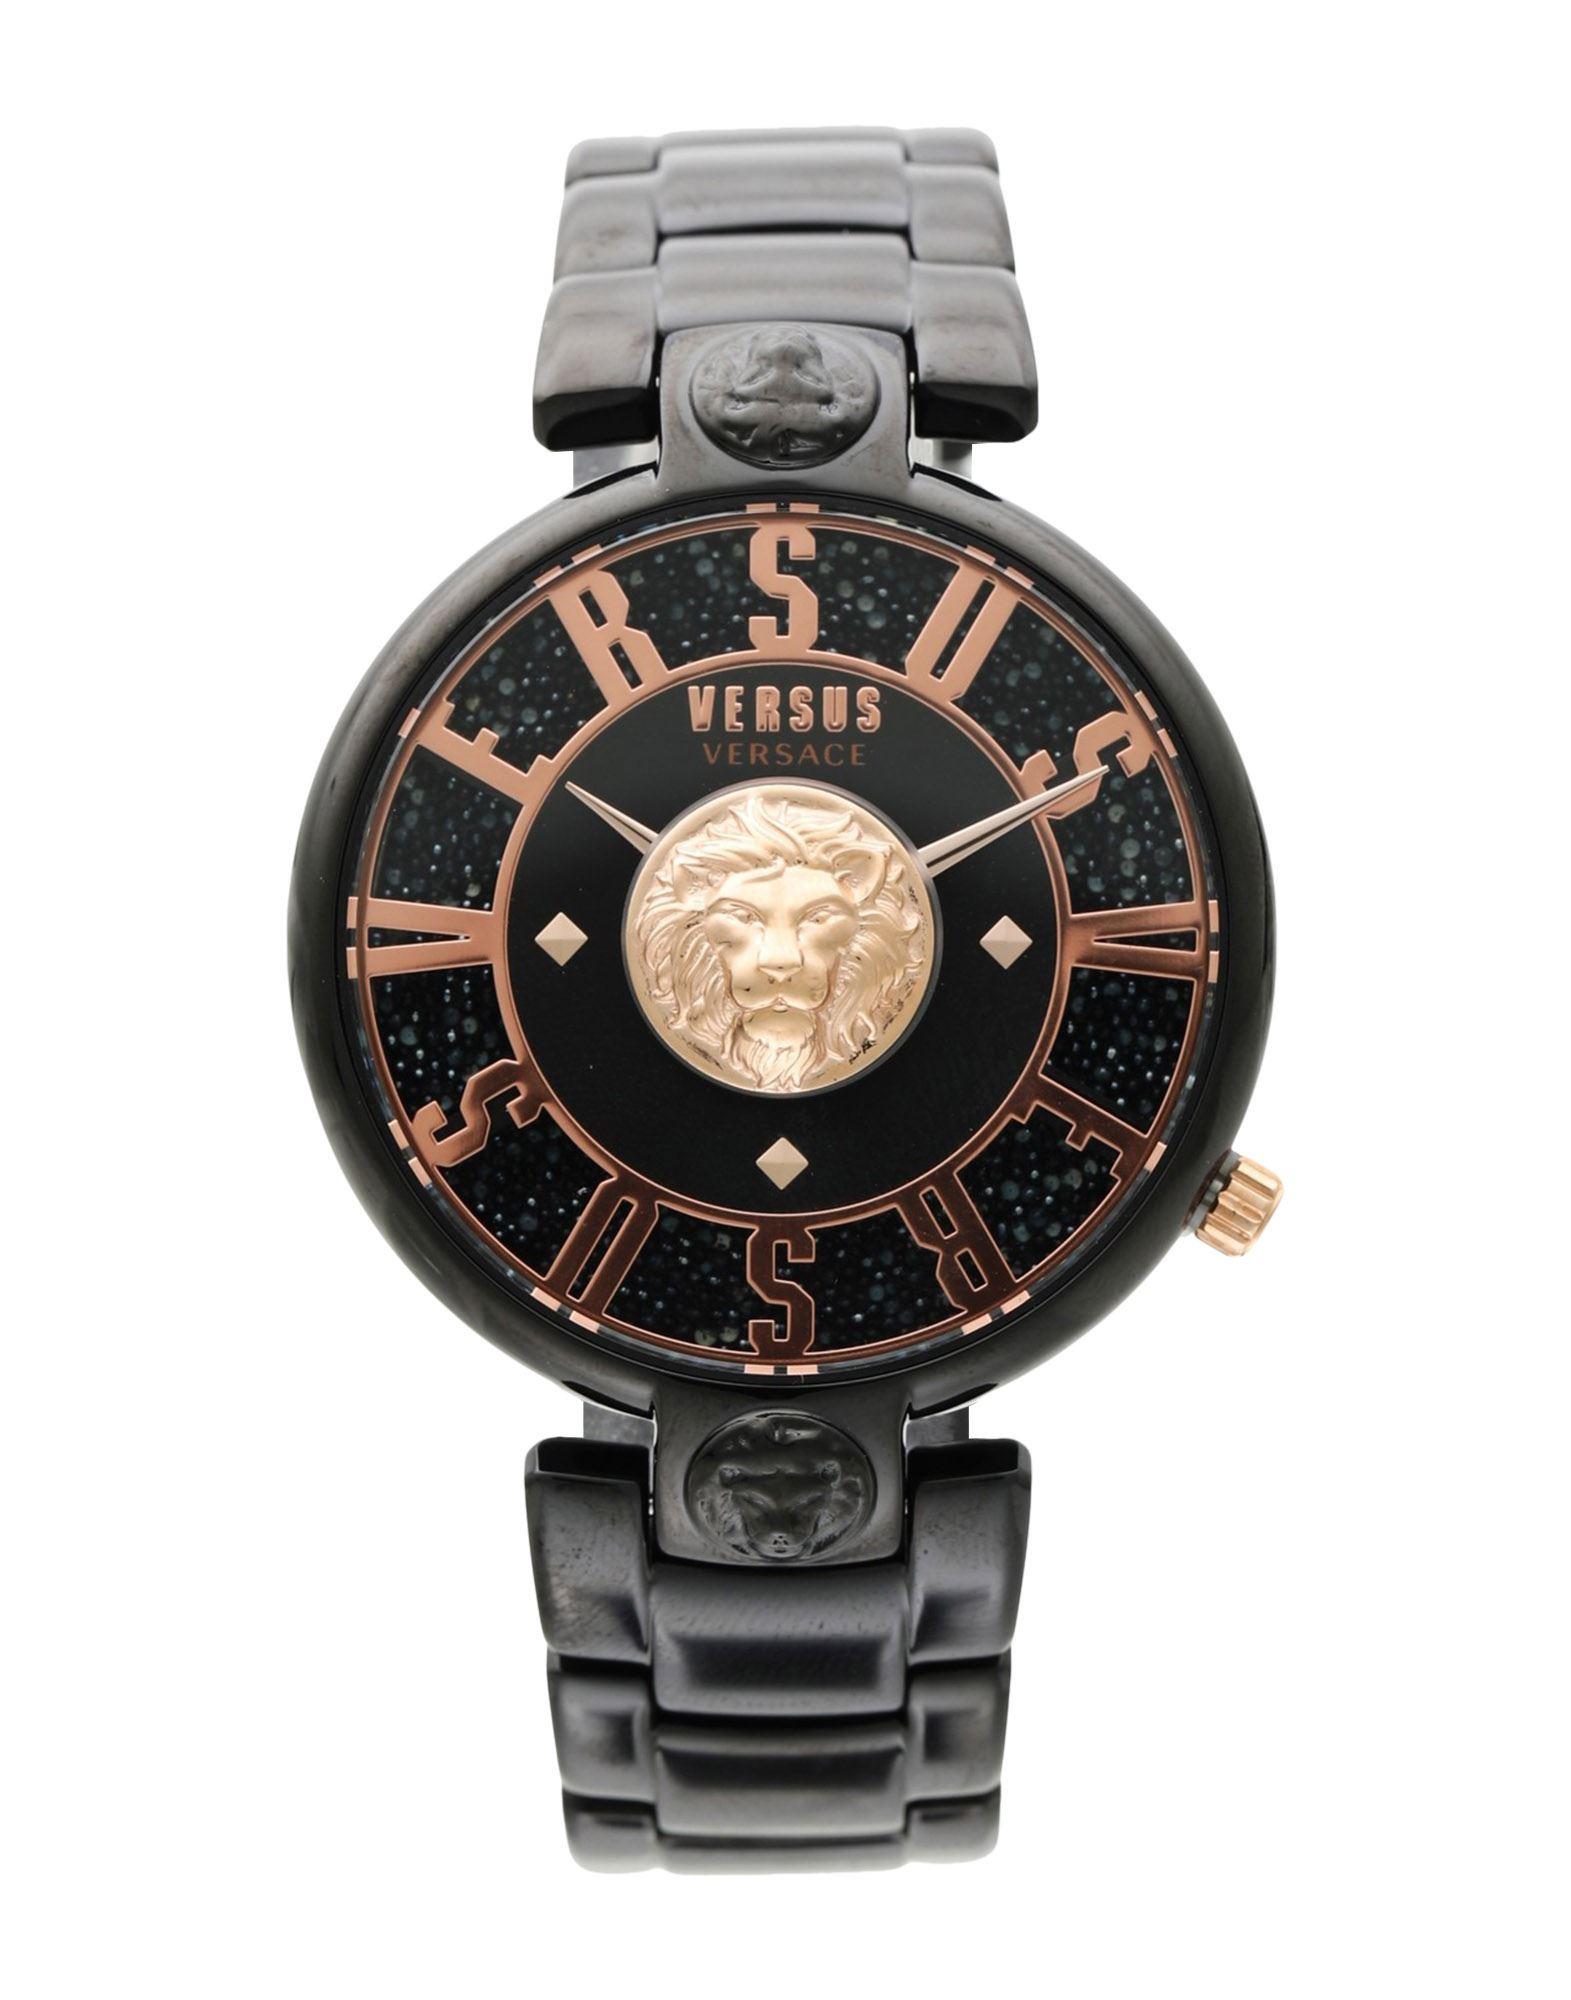 VERSUS VERSACE Wrist watches - Item 58052188